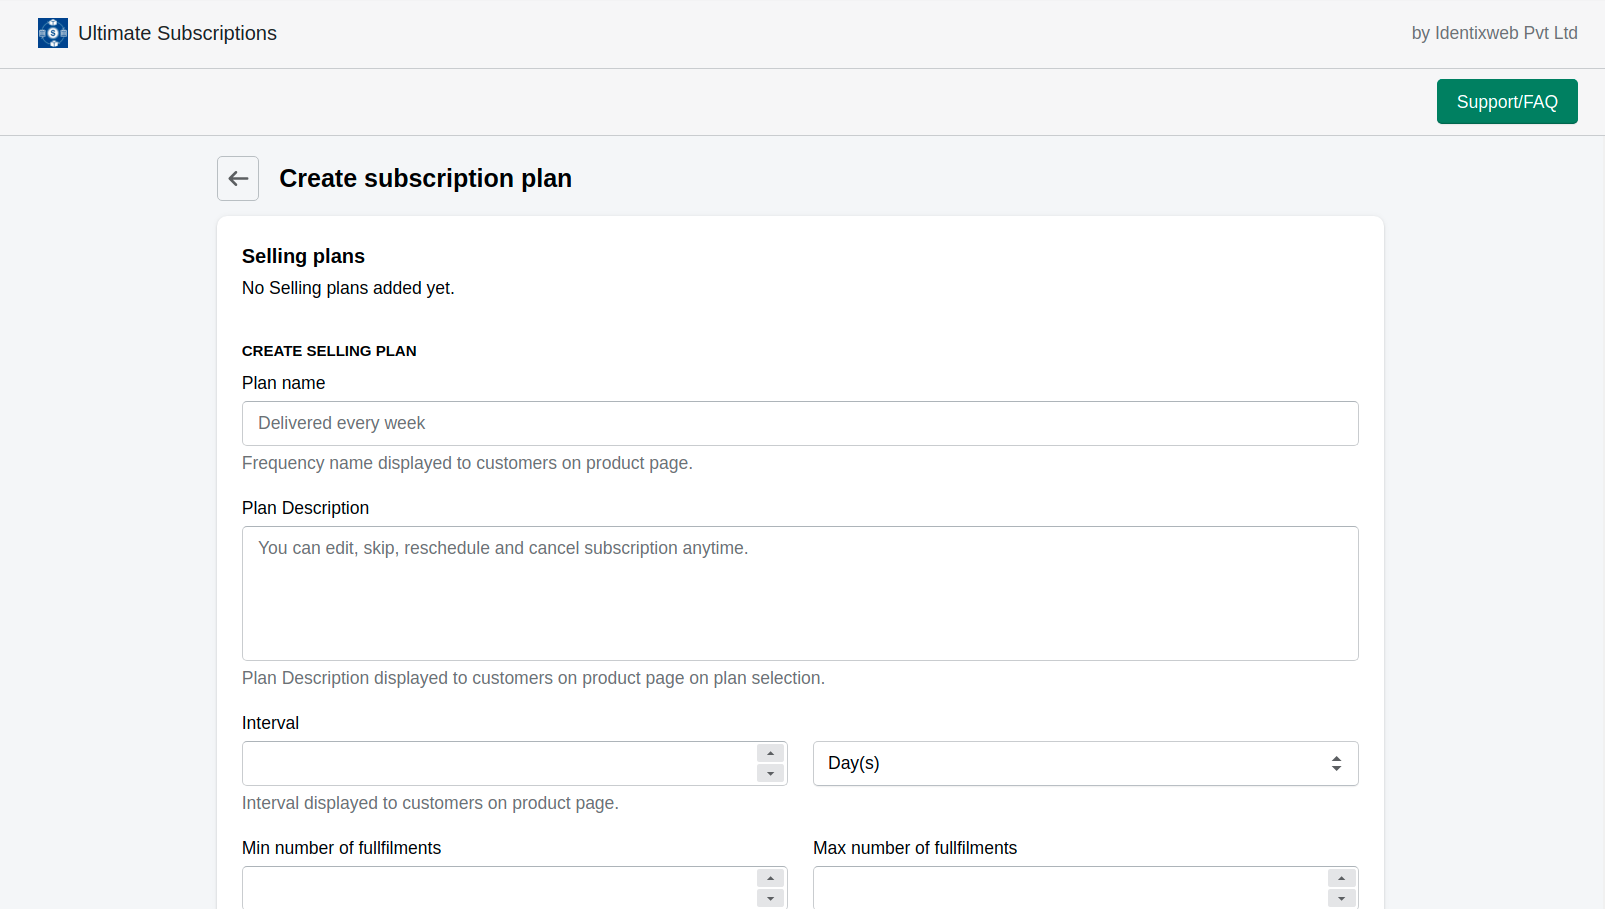 add-subscription-plan-details